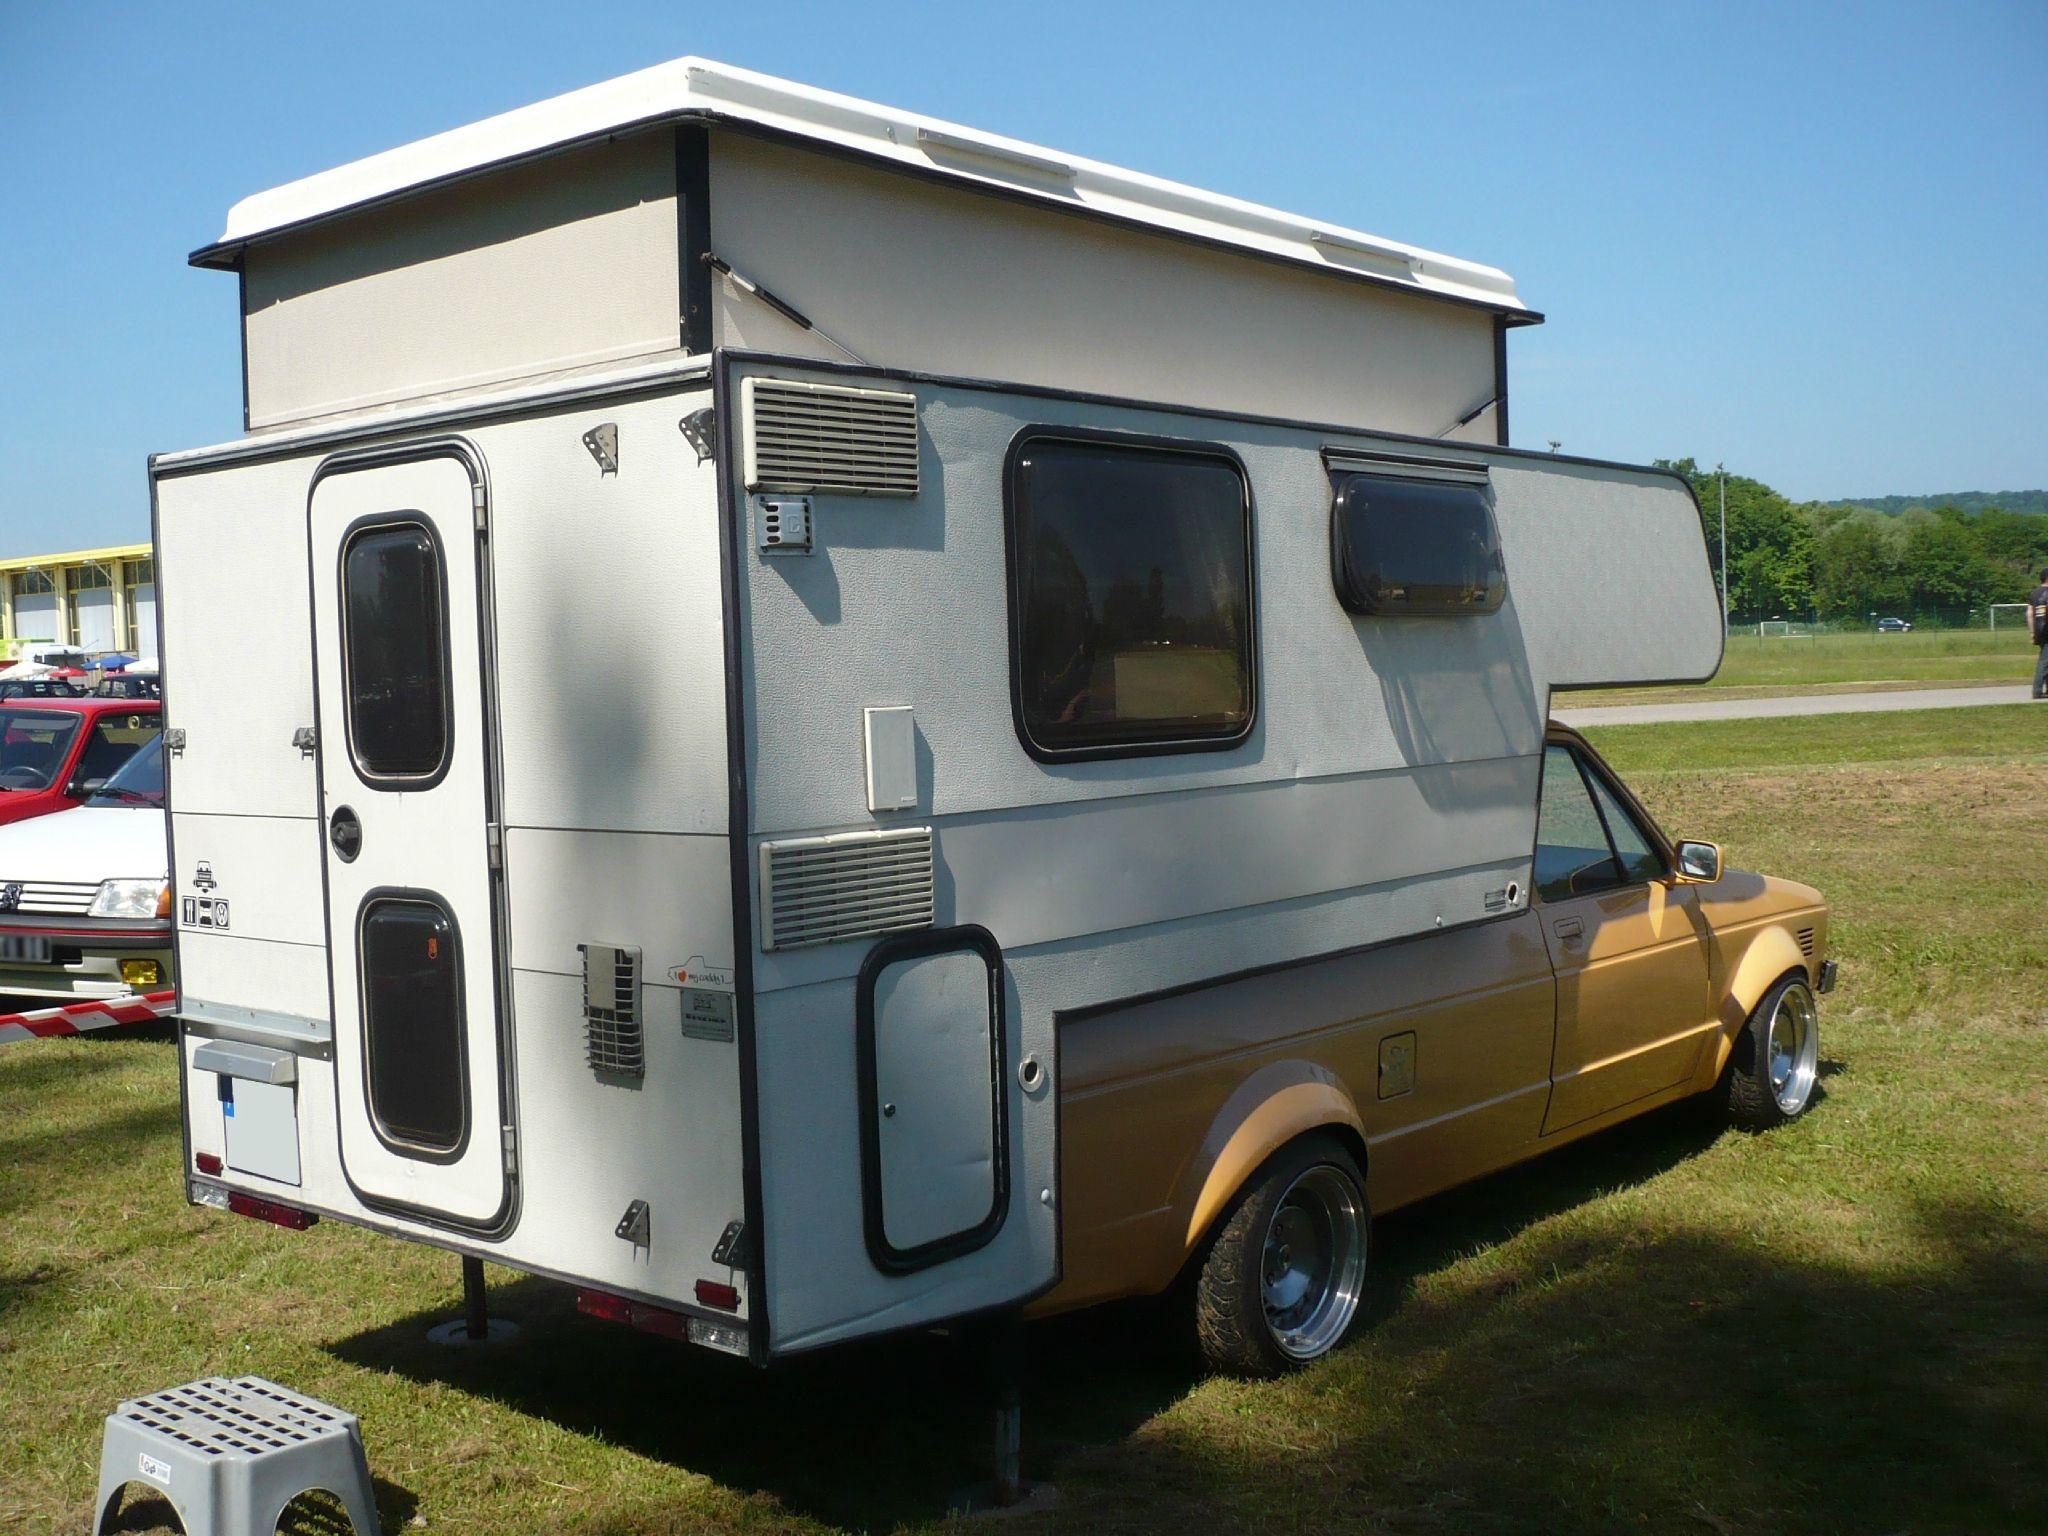 volkswagen caddy pick up avec cellule camping car vroom vroom volkswagen caddy volkswagen. Black Bedroom Furniture Sets. Home Design Ideas